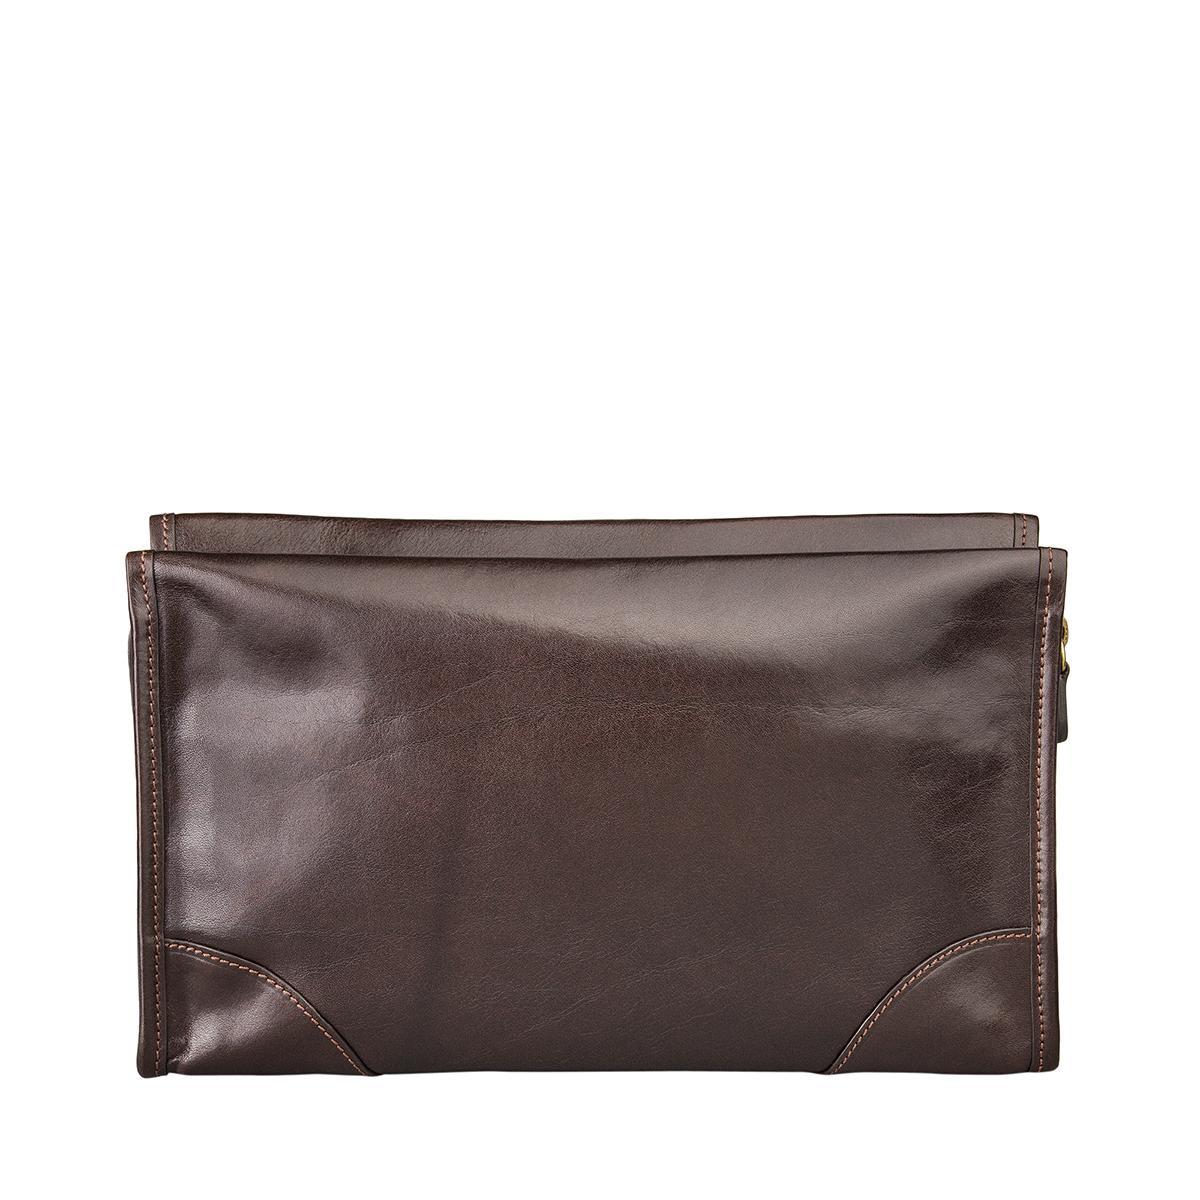 maxwell scott bags luxus reise kulturbeutel aus leder in dunkelbraun tanta. Black Bedroom Furniture Sets. Home Design Ideas